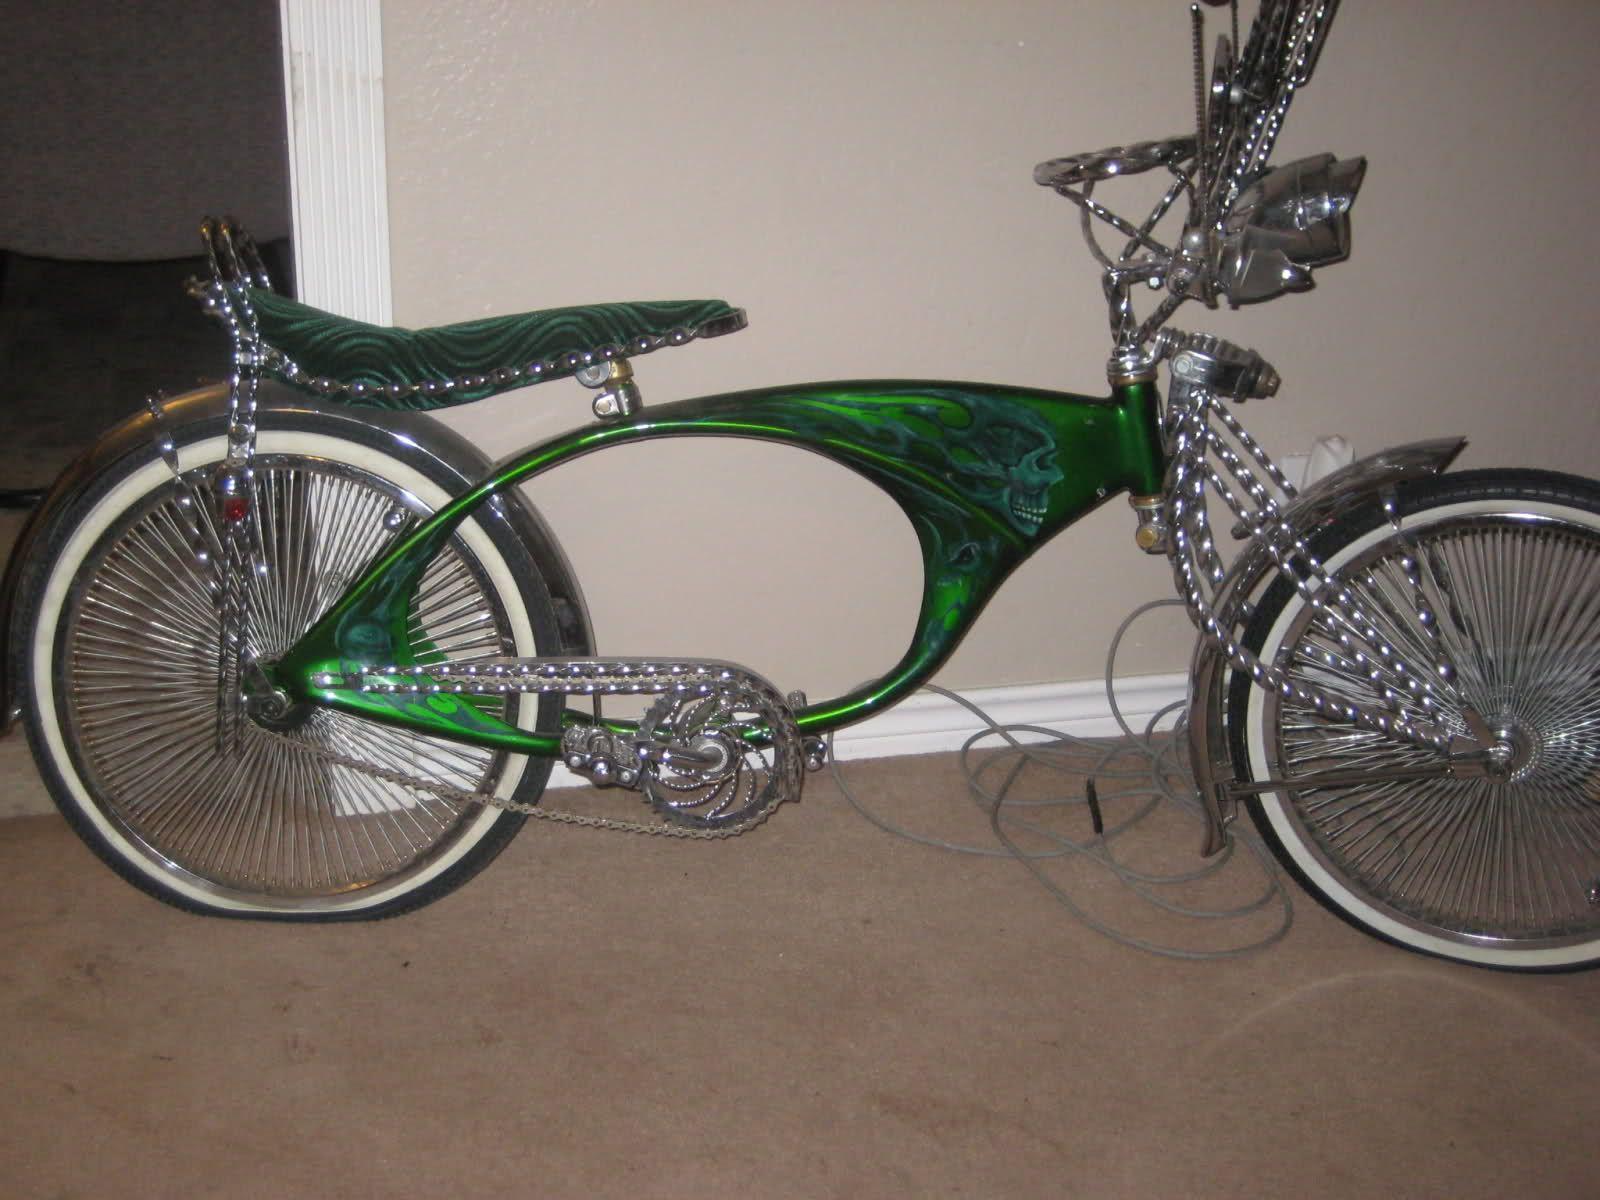 Lowrider Bicycle Thread My Sons Lowrider Bike Lowrider Bike